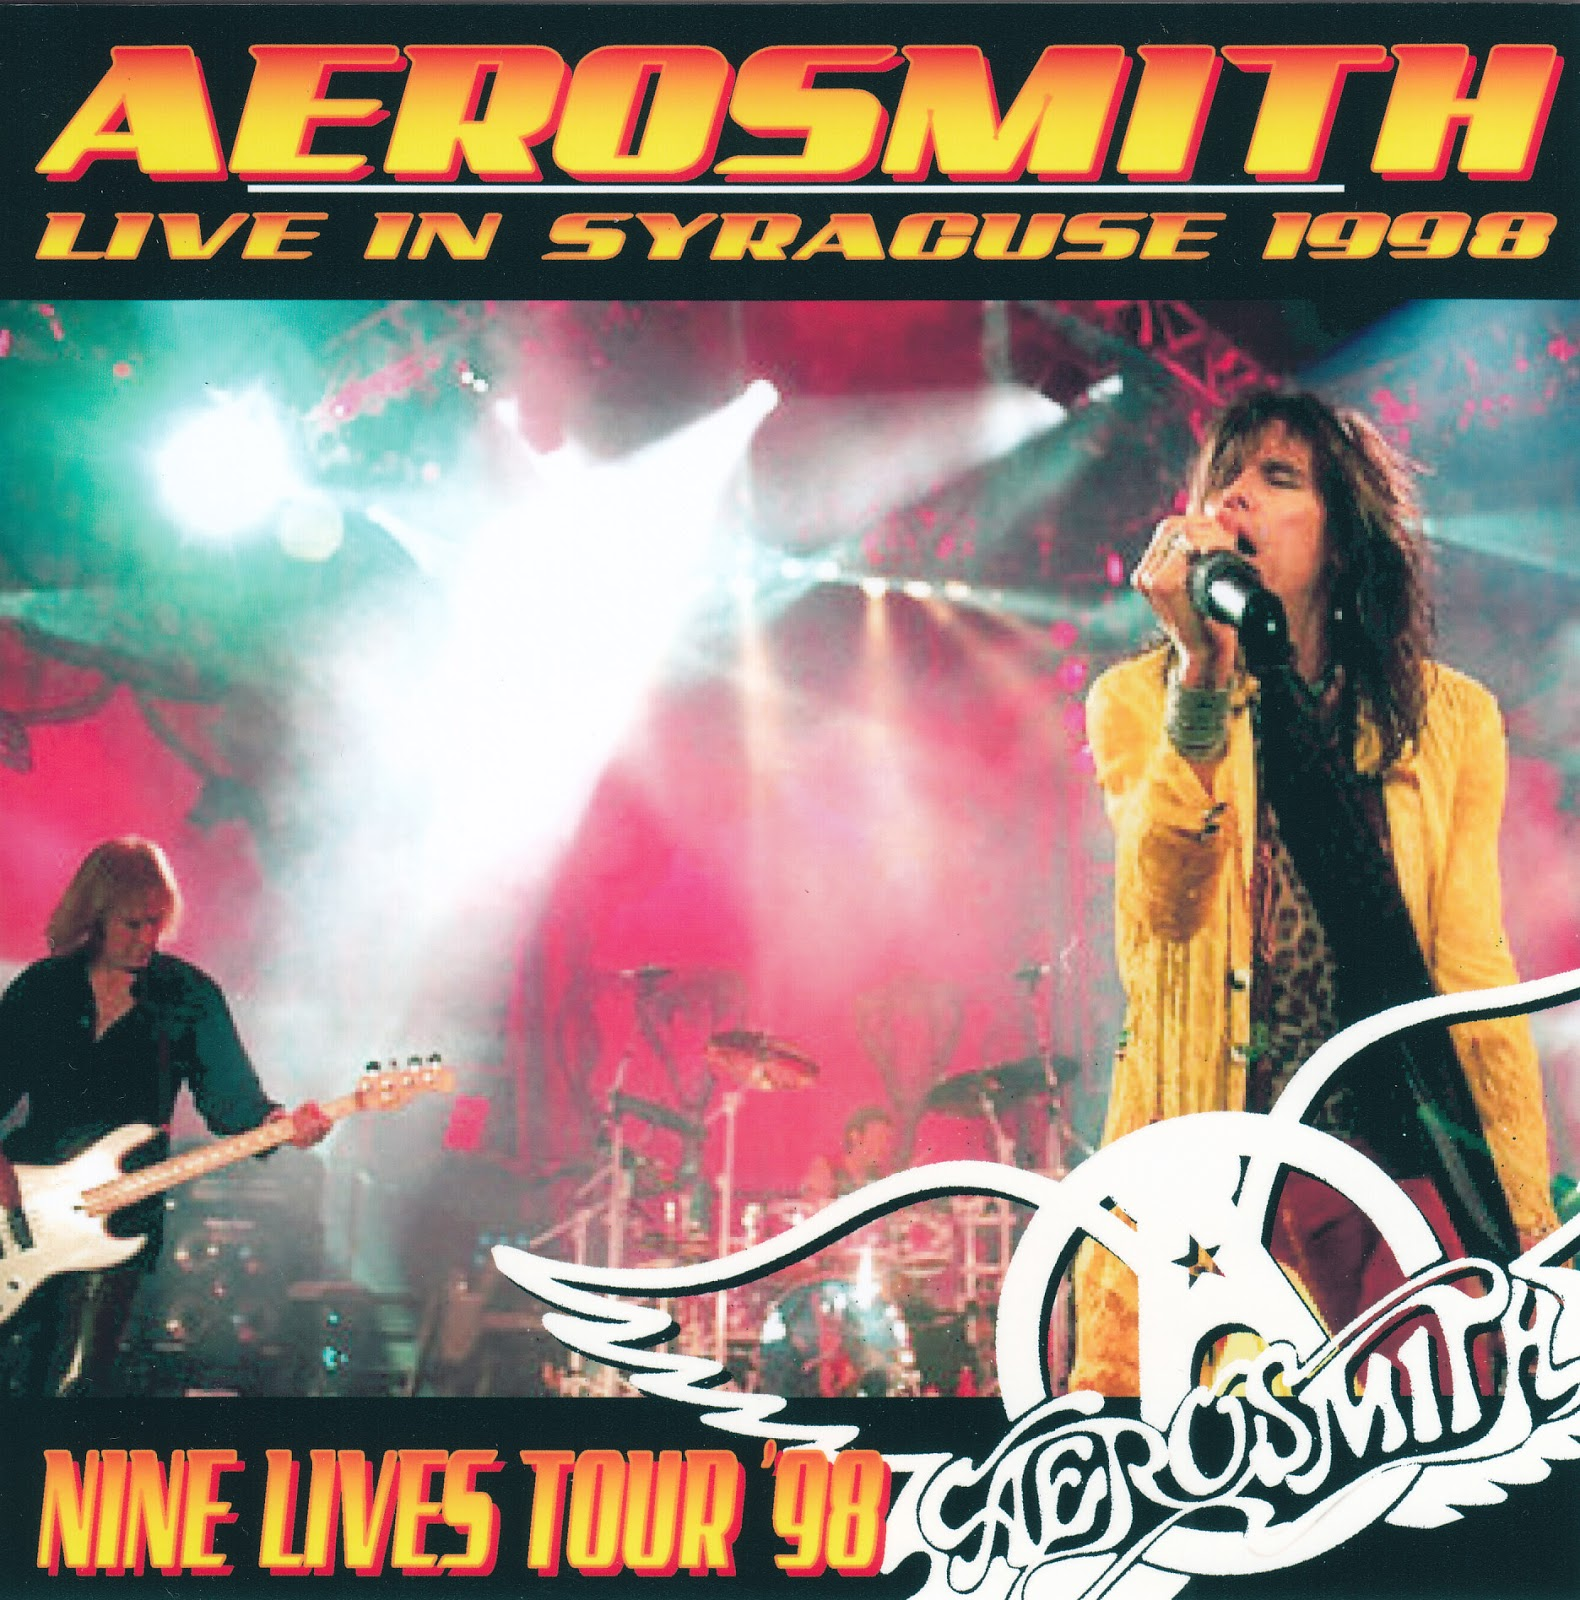 Aerosmith Bootlegs Cover Arts Live In Syracuse 1998